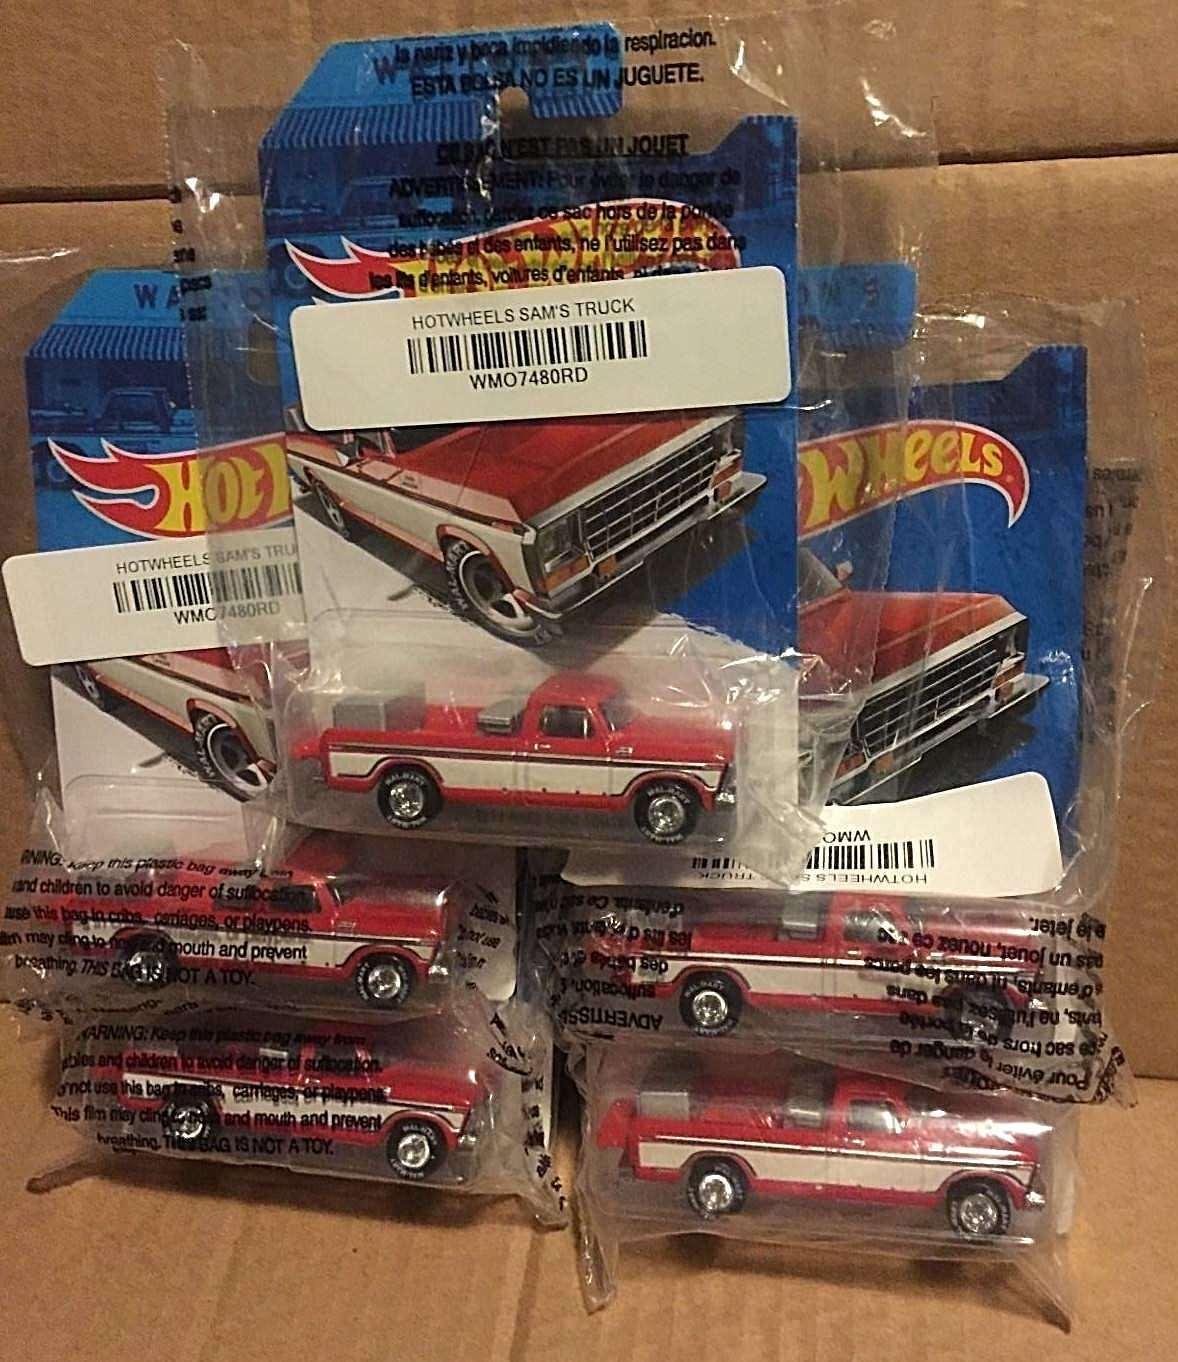 Hot Wheels 2015 Sam Waltons 1979 Ford F-150 Camioneta Lote de 5